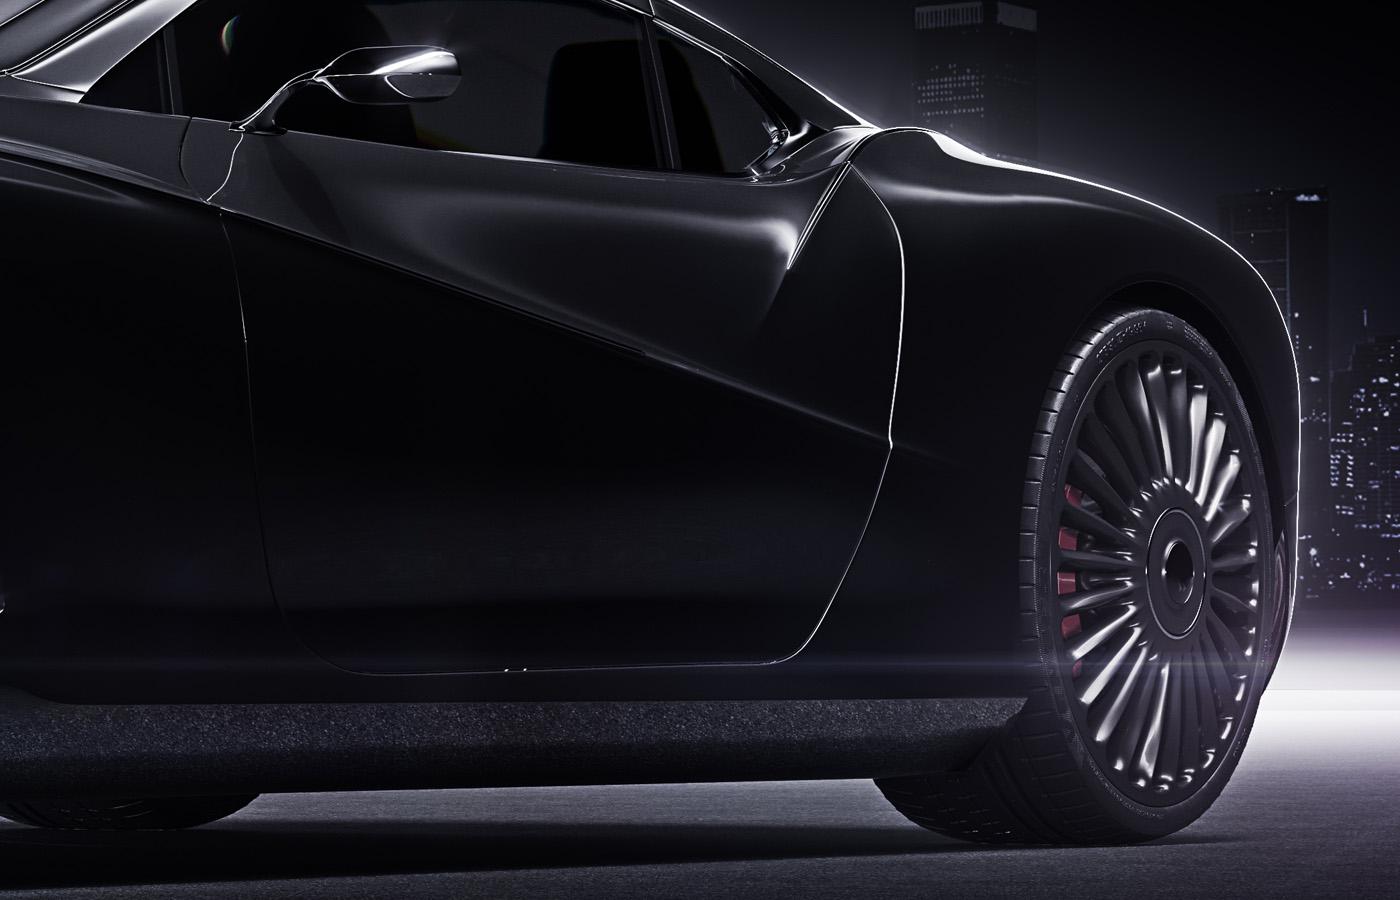 Rolls Royce luxury automotive design 2 2.jpg